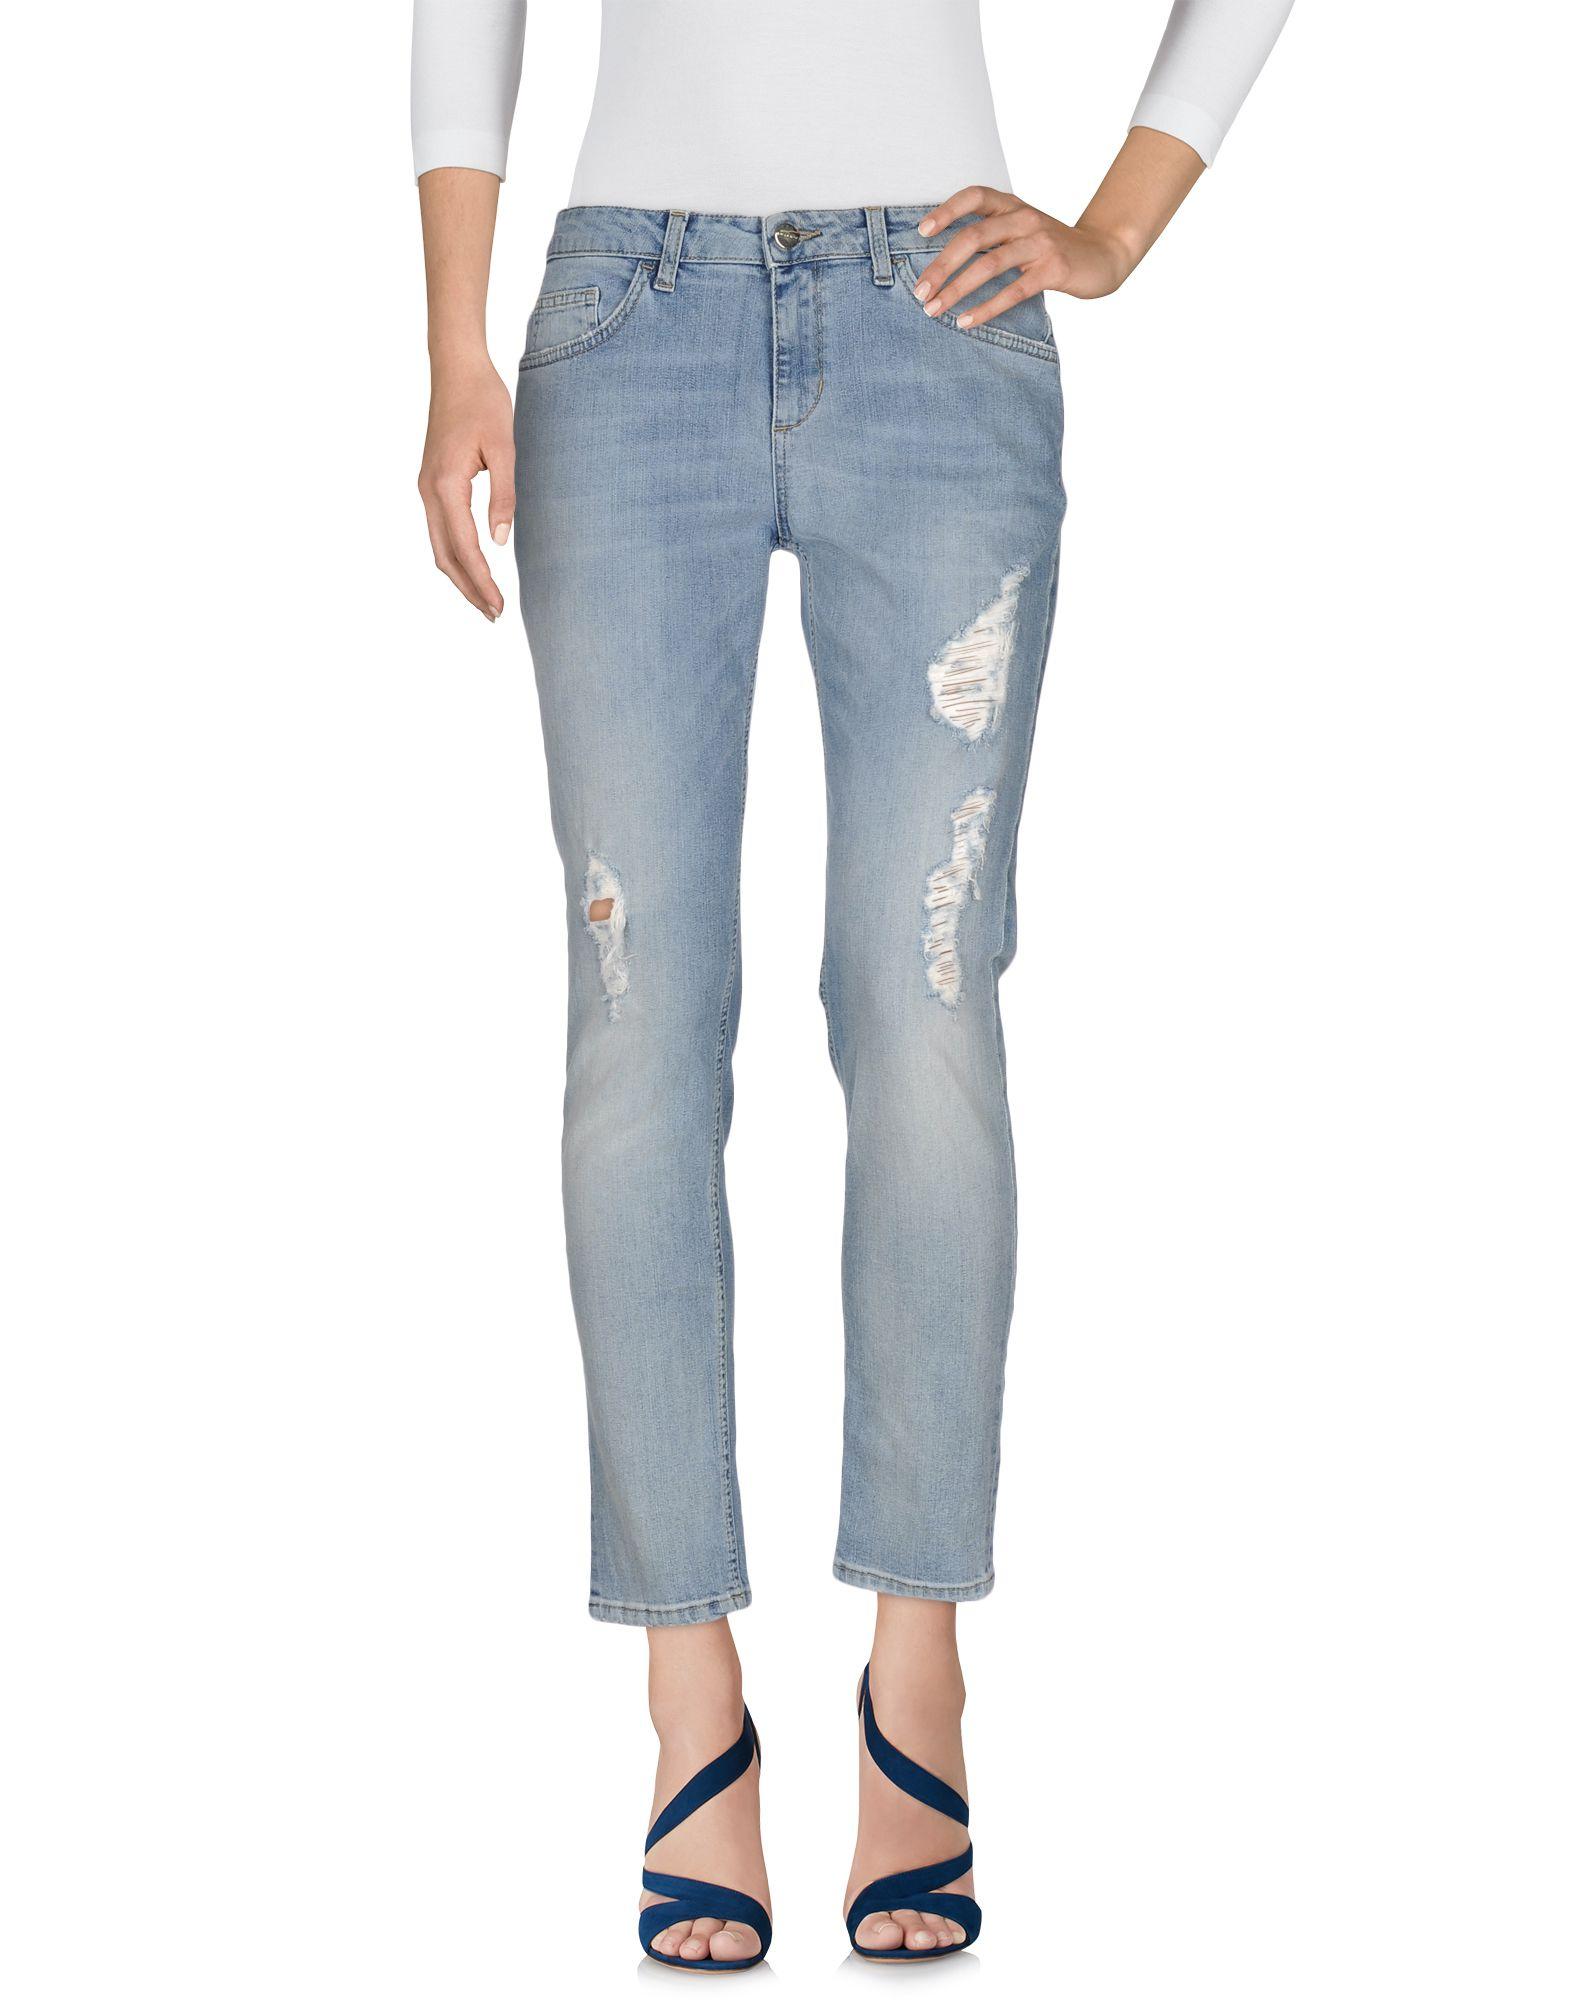 ФОТО swish•j джинсовые брюки